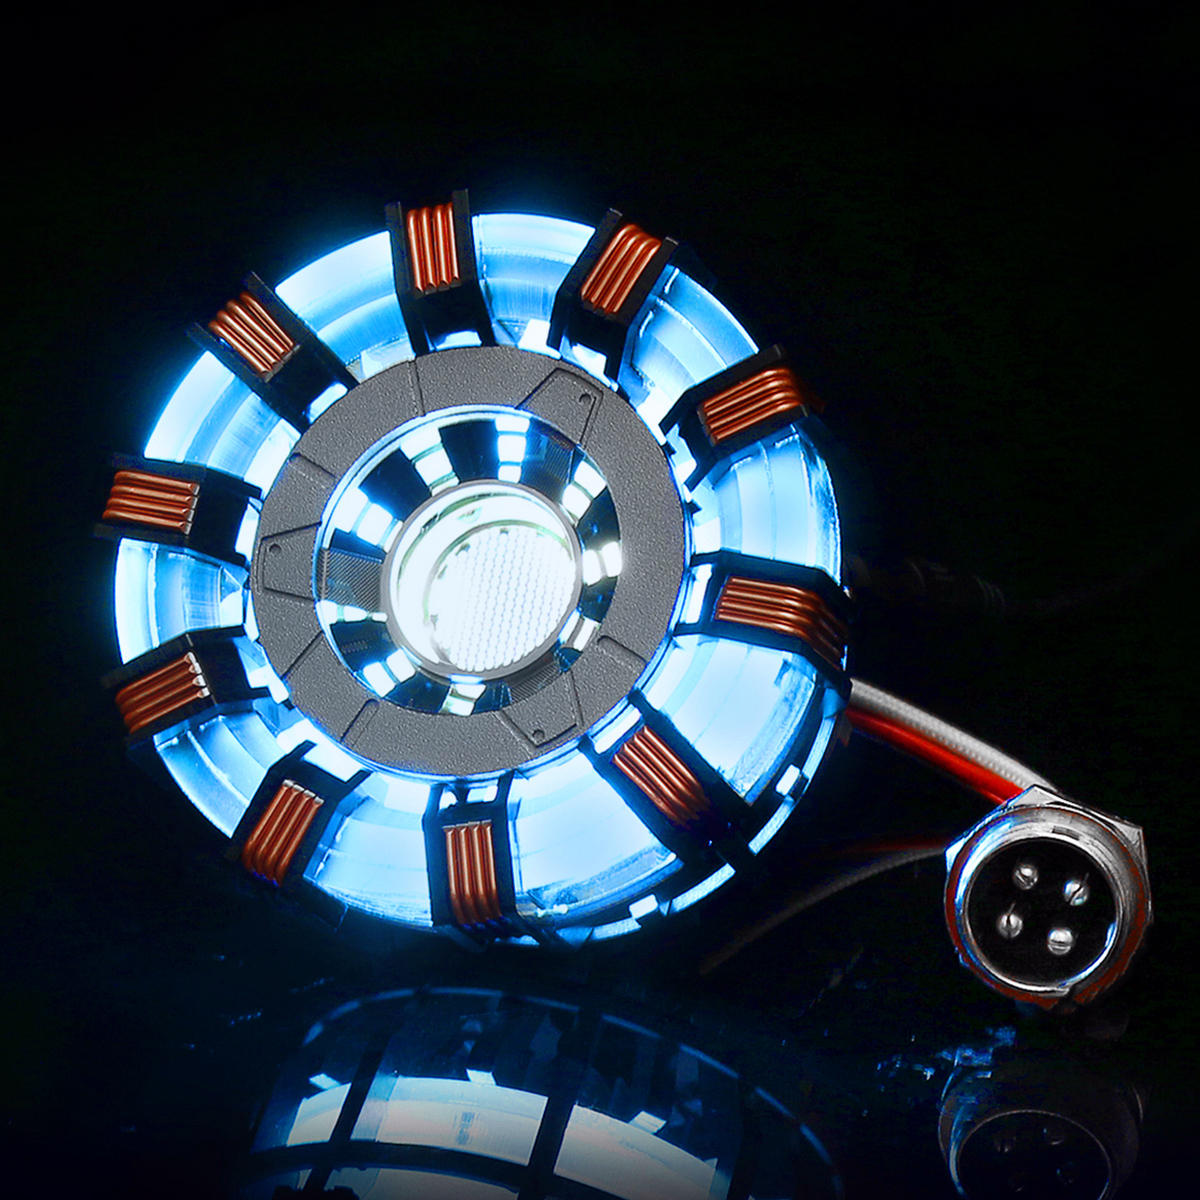 MK2 Tony DIY Arc Reactor Lámpara Kit de iluminador de acero inoxidable LED Flash Juego de luces